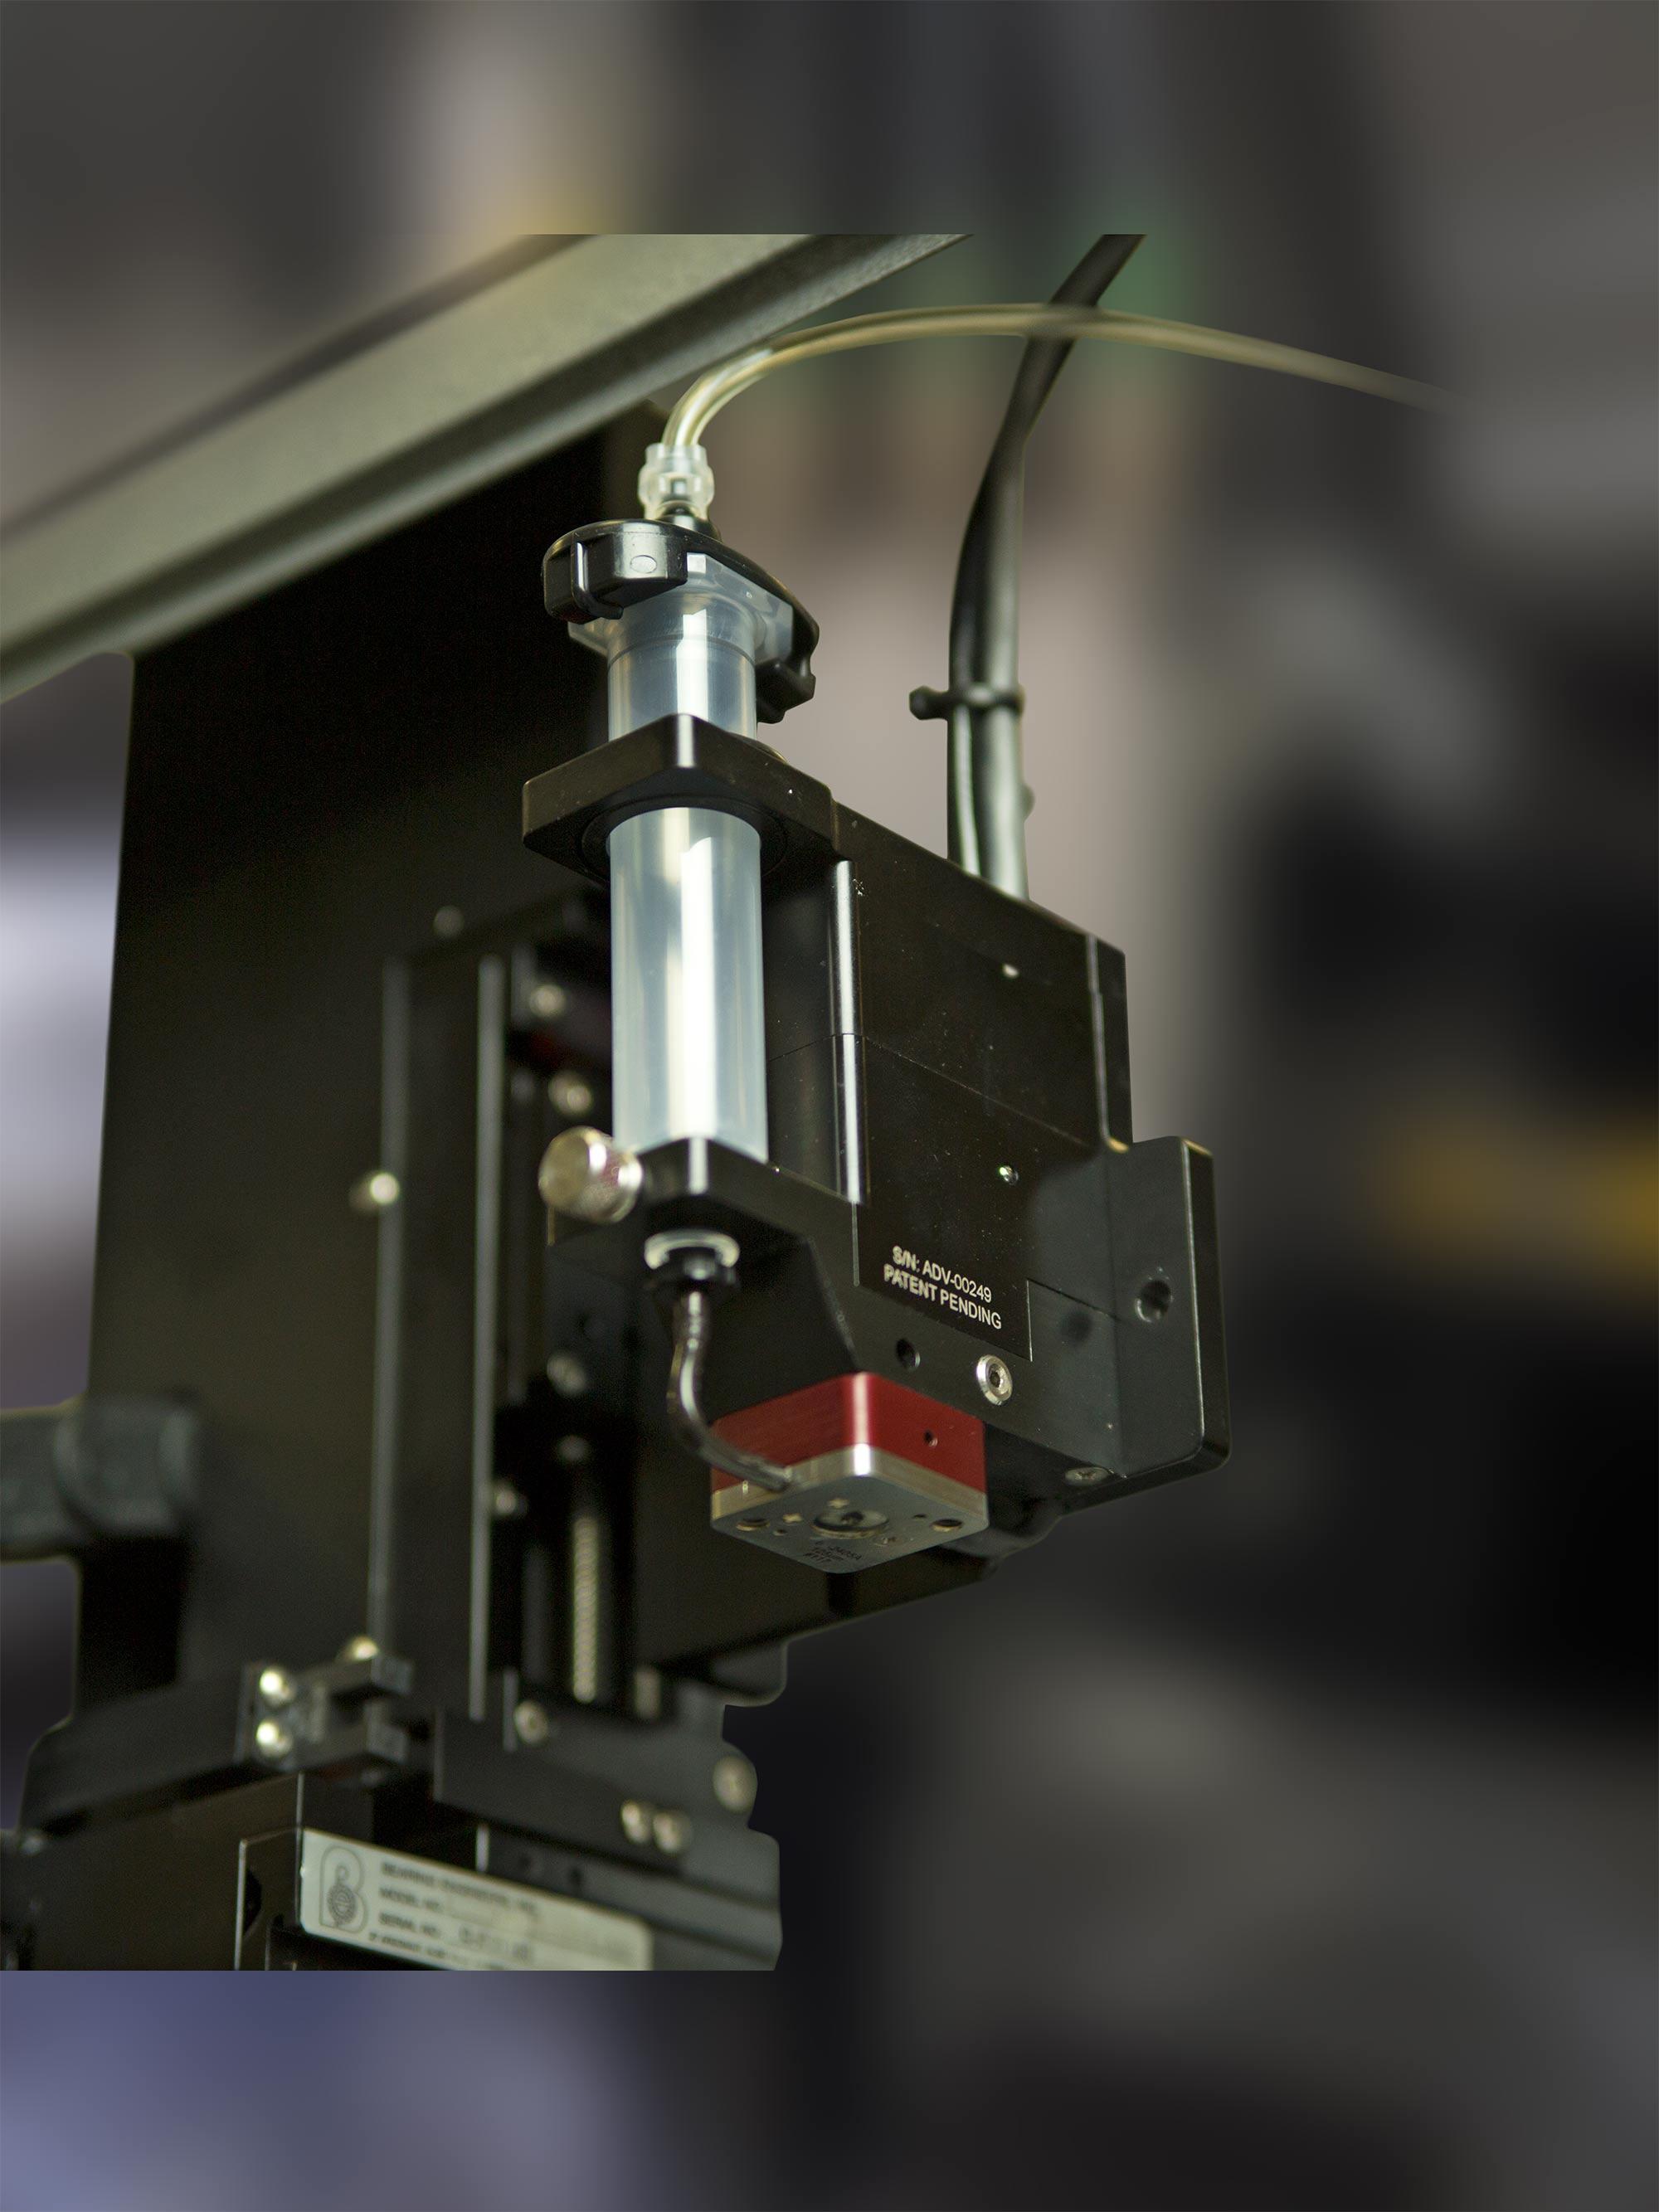 PolyJet Dispensing Technology by BioDot